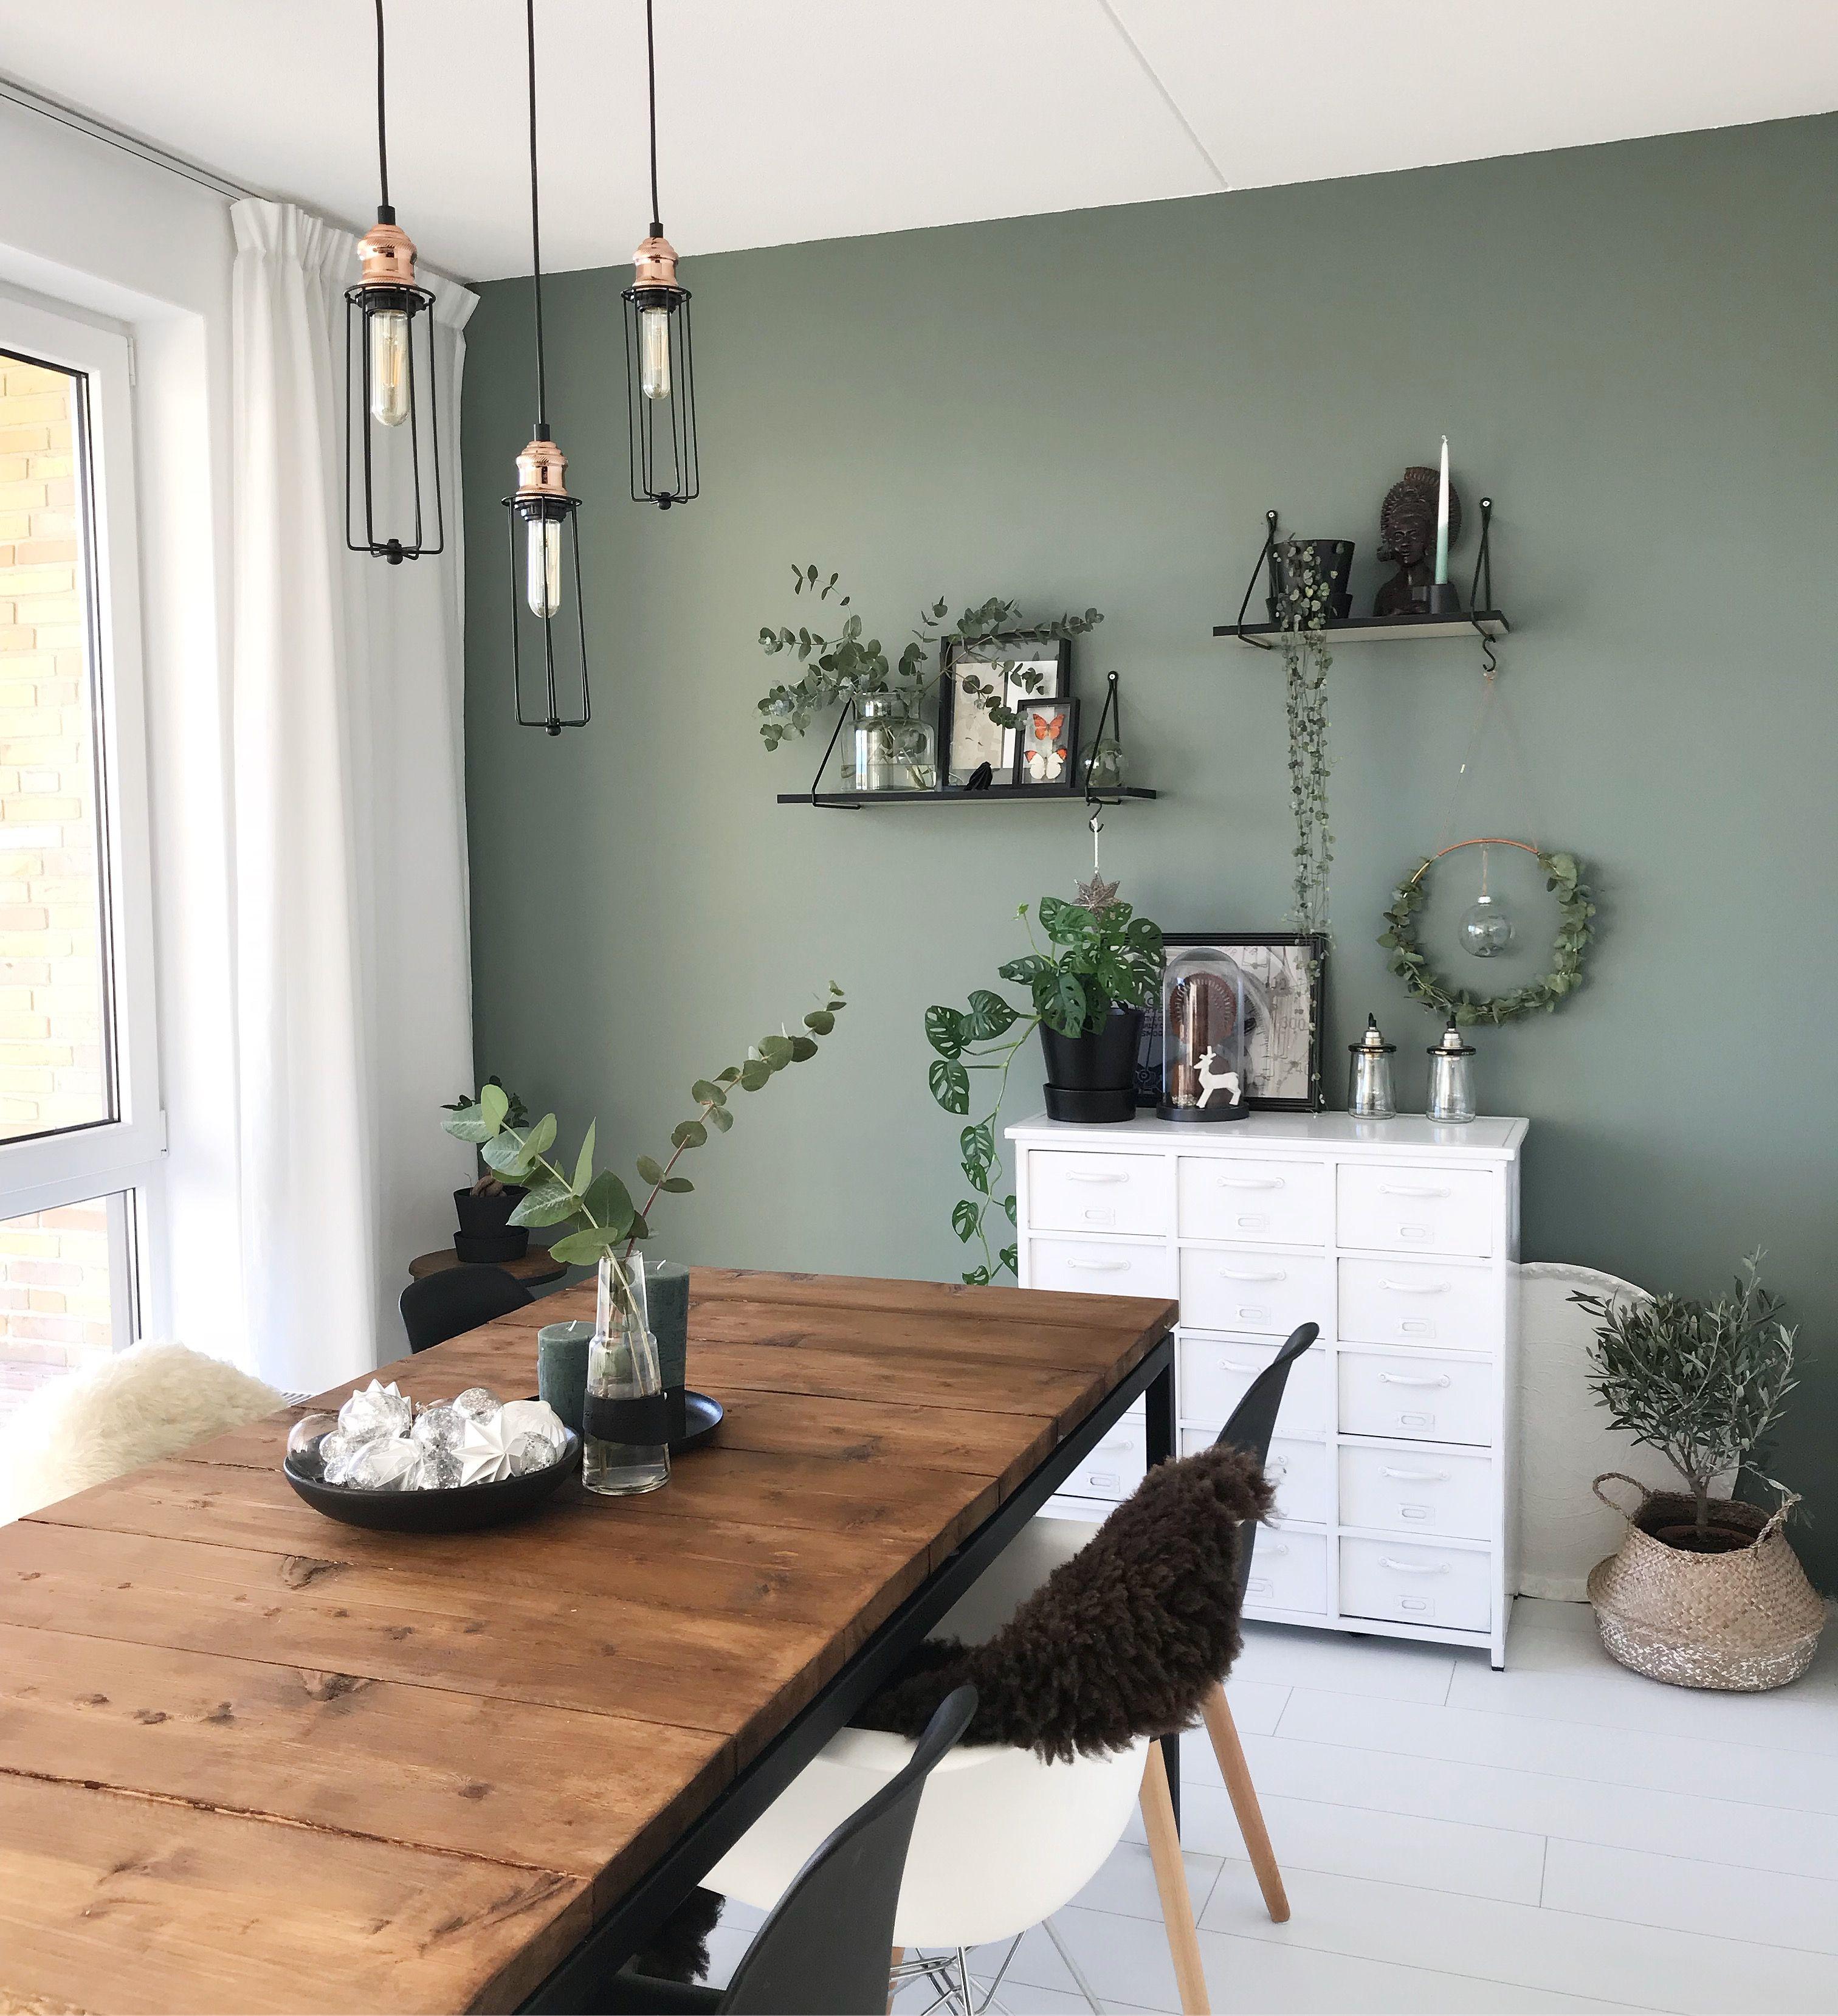 Kamer Kleuren Ideeen.Mooie Kleur Muur Home In 2019 Woonkamer Appartement Eetkamer